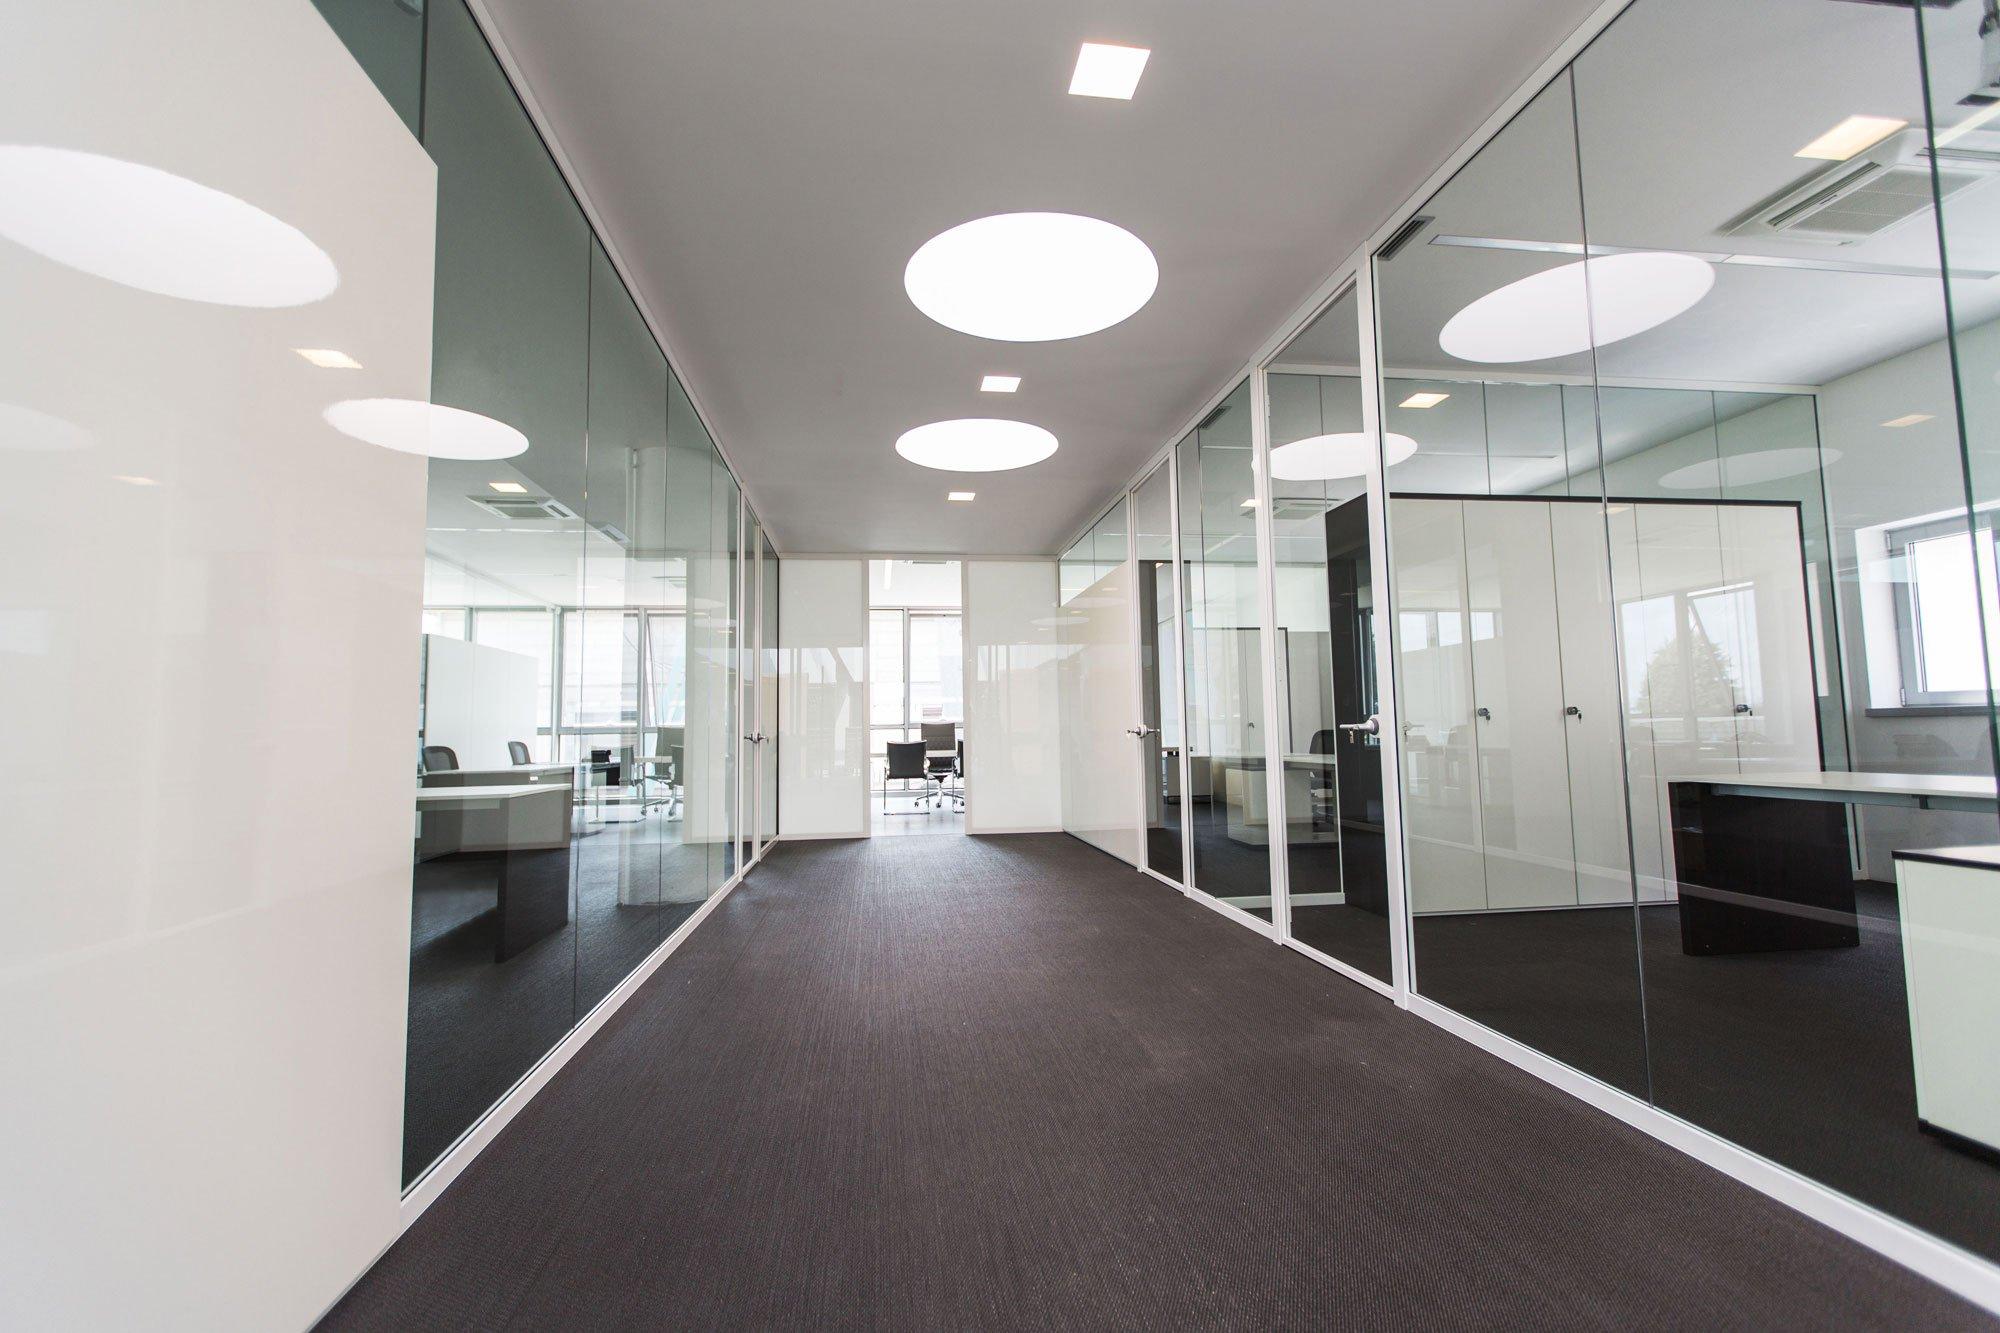 Illuminazione per uffici a led: sistemi di illuminazione per interni